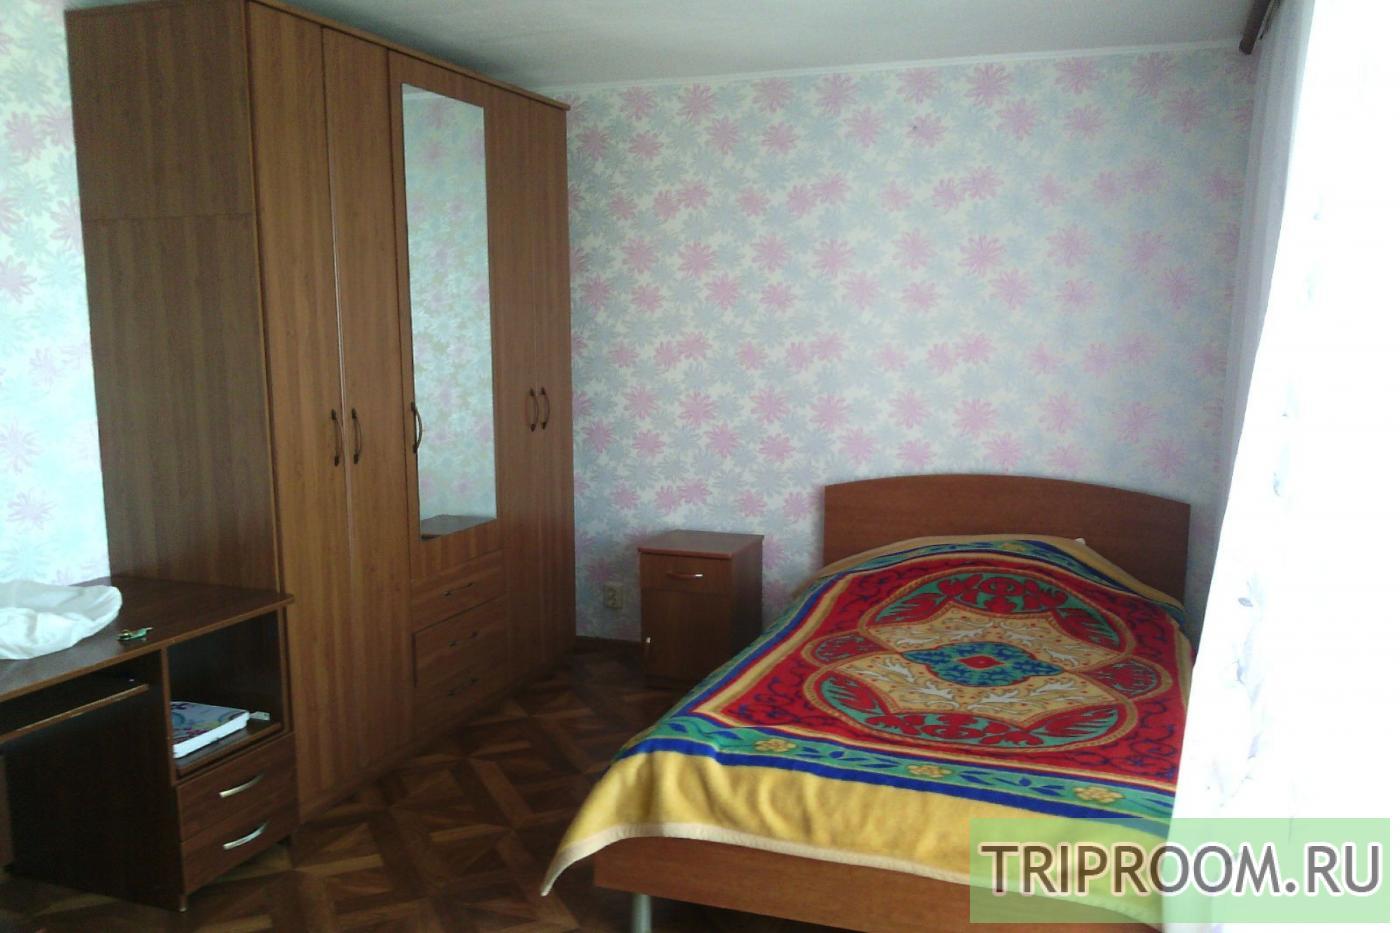 2-комнатная квартира посуточно (вариант № 33661), ул. Морозова Павла Леонтьевича, фото № 9